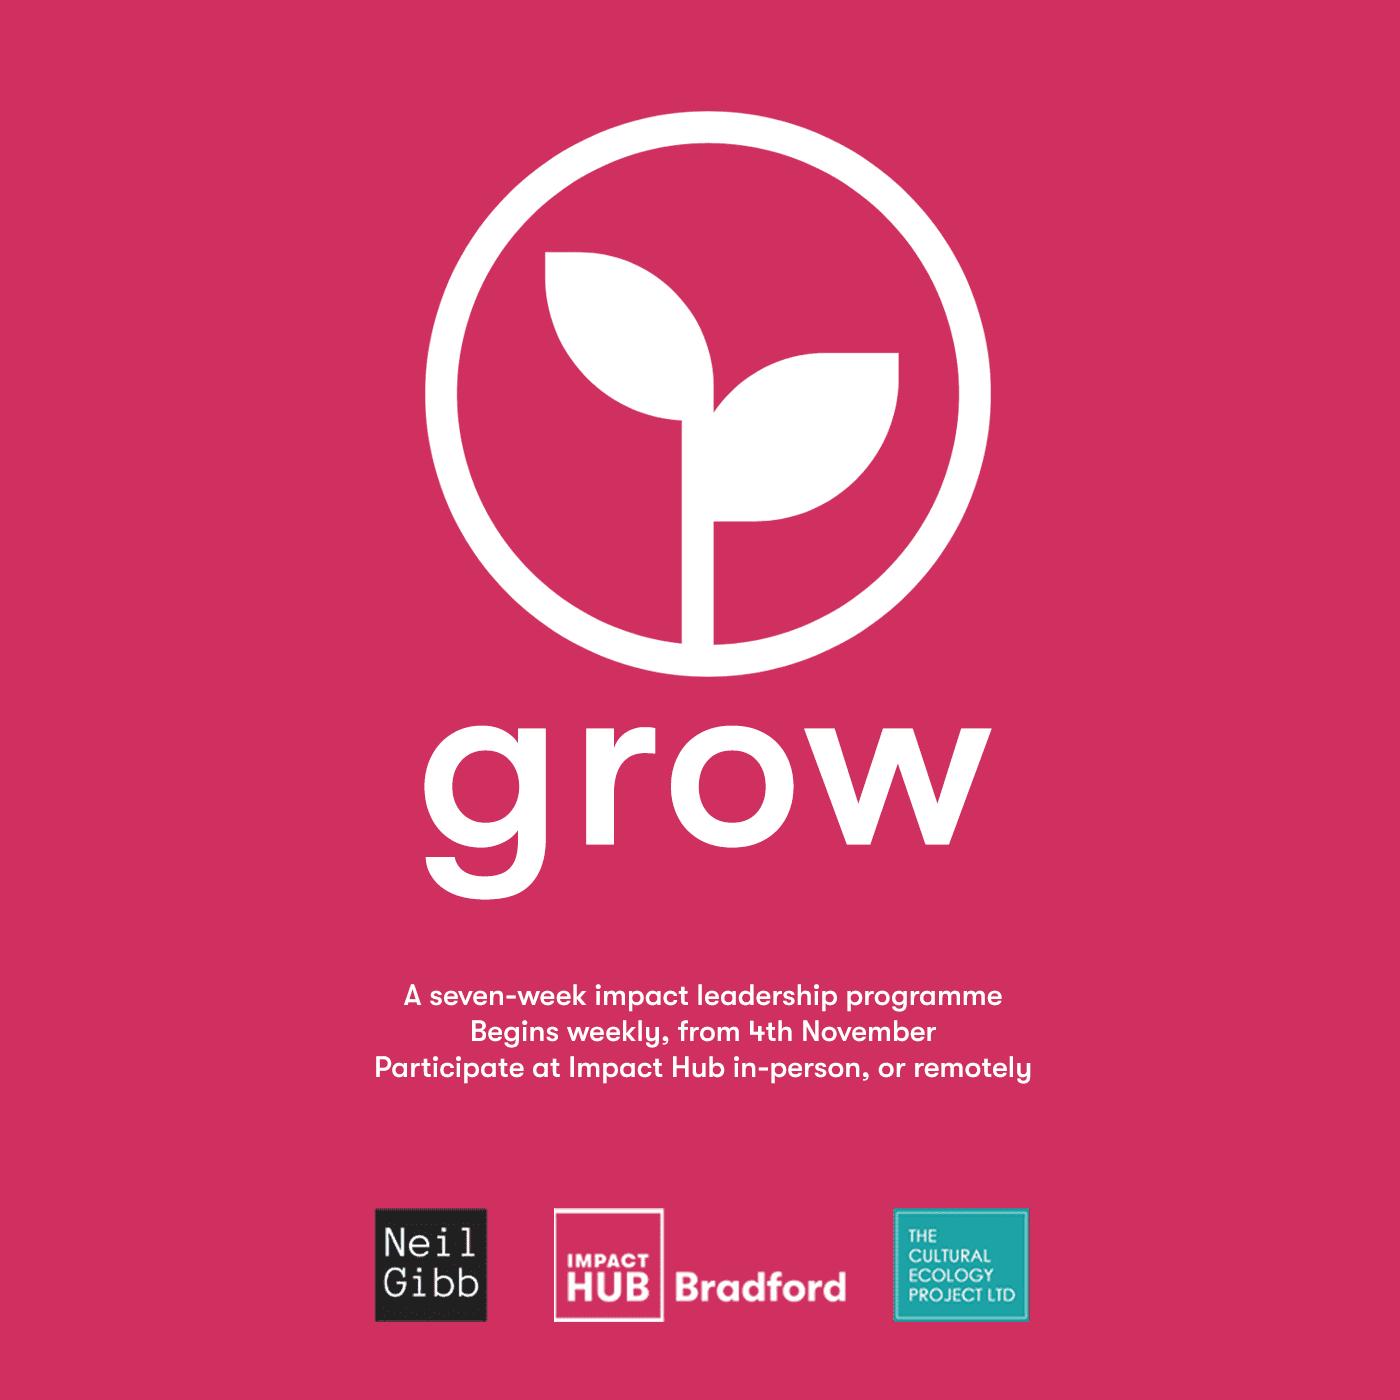 GROW: A seven-week impact leadership programme